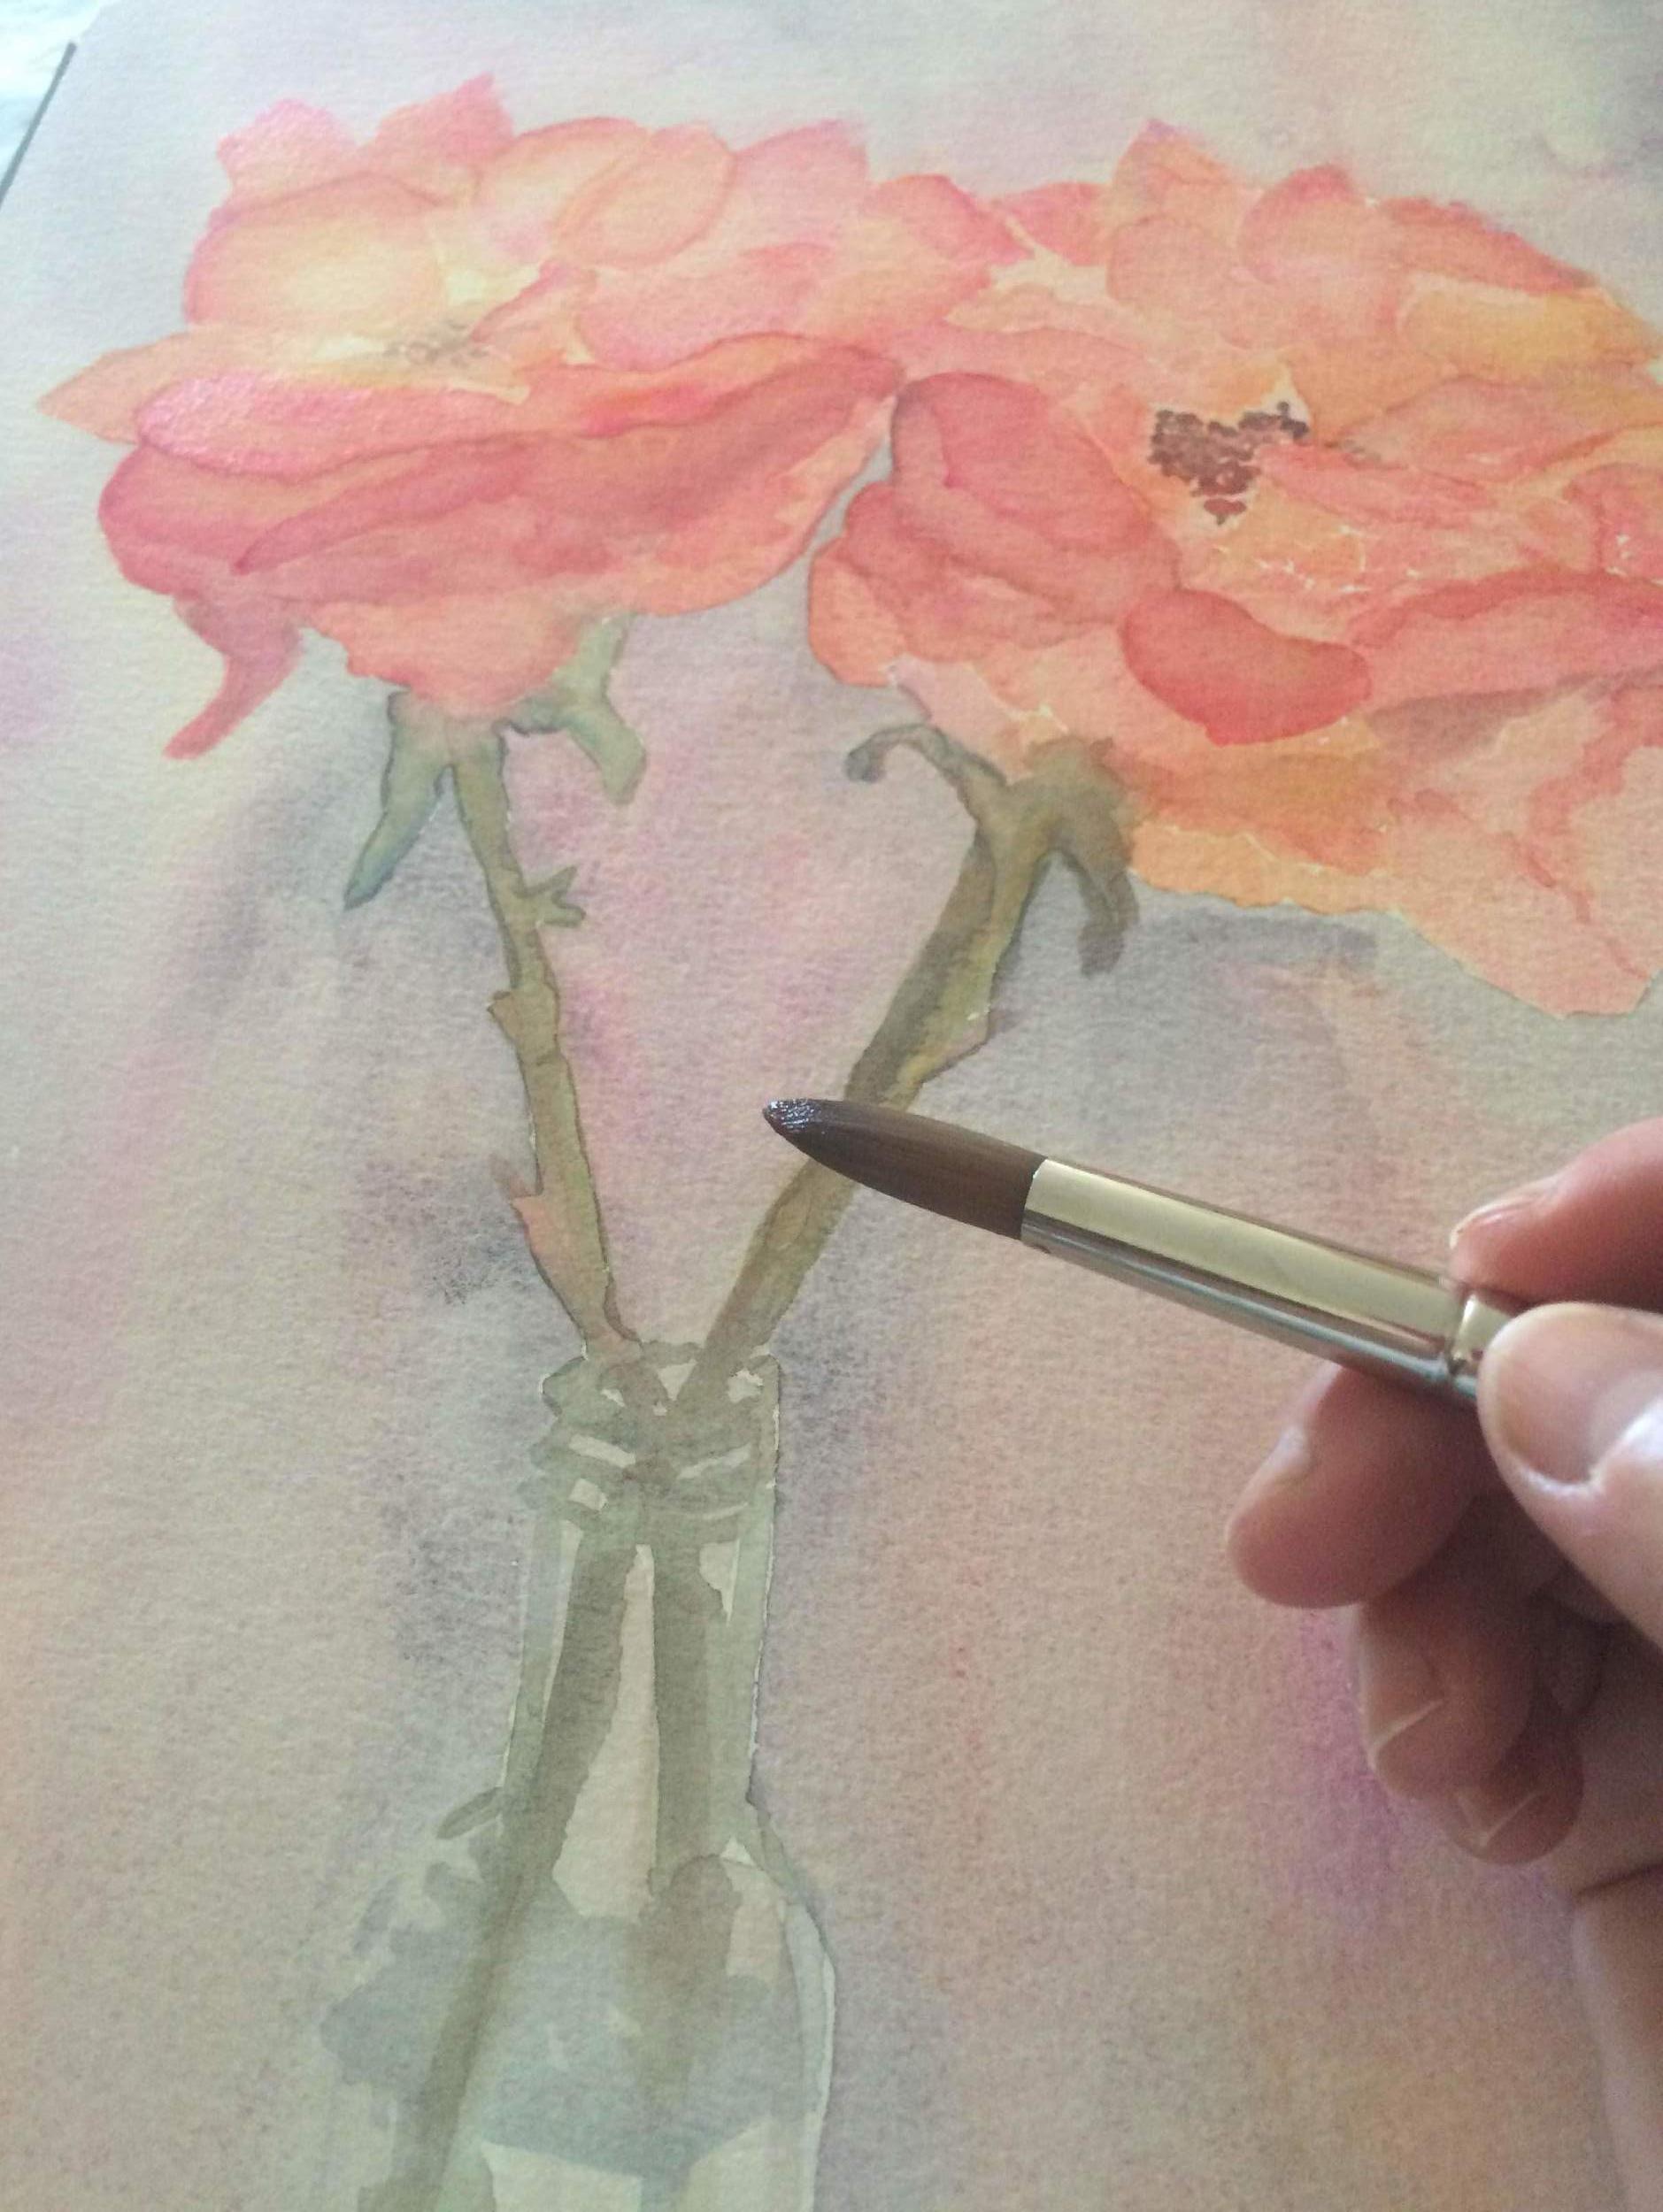 Carol Painting Roses from her California Garden 08-10-2016 (Selfie Photo)